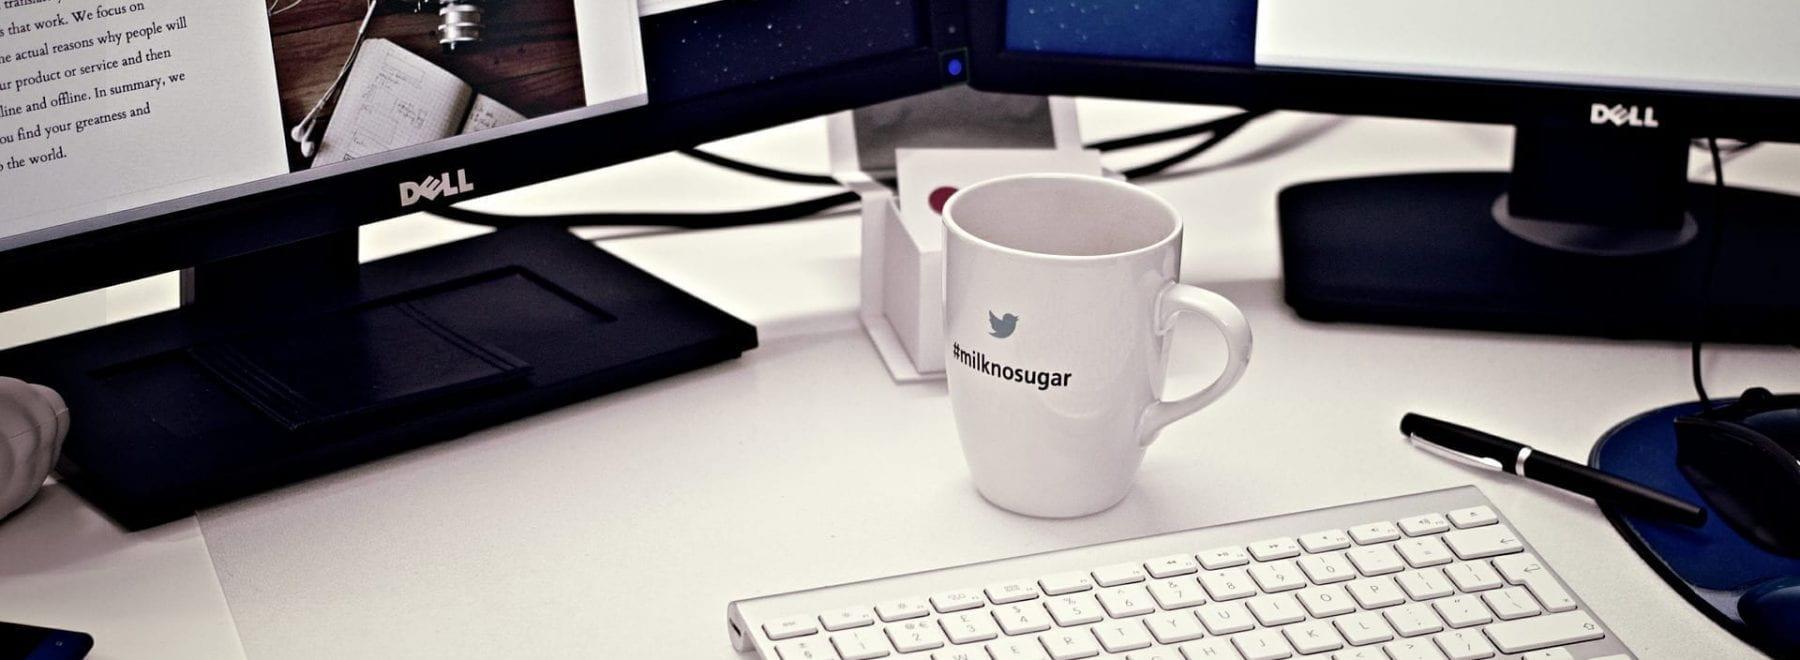 Two computer screes, a keyboard and a mug.